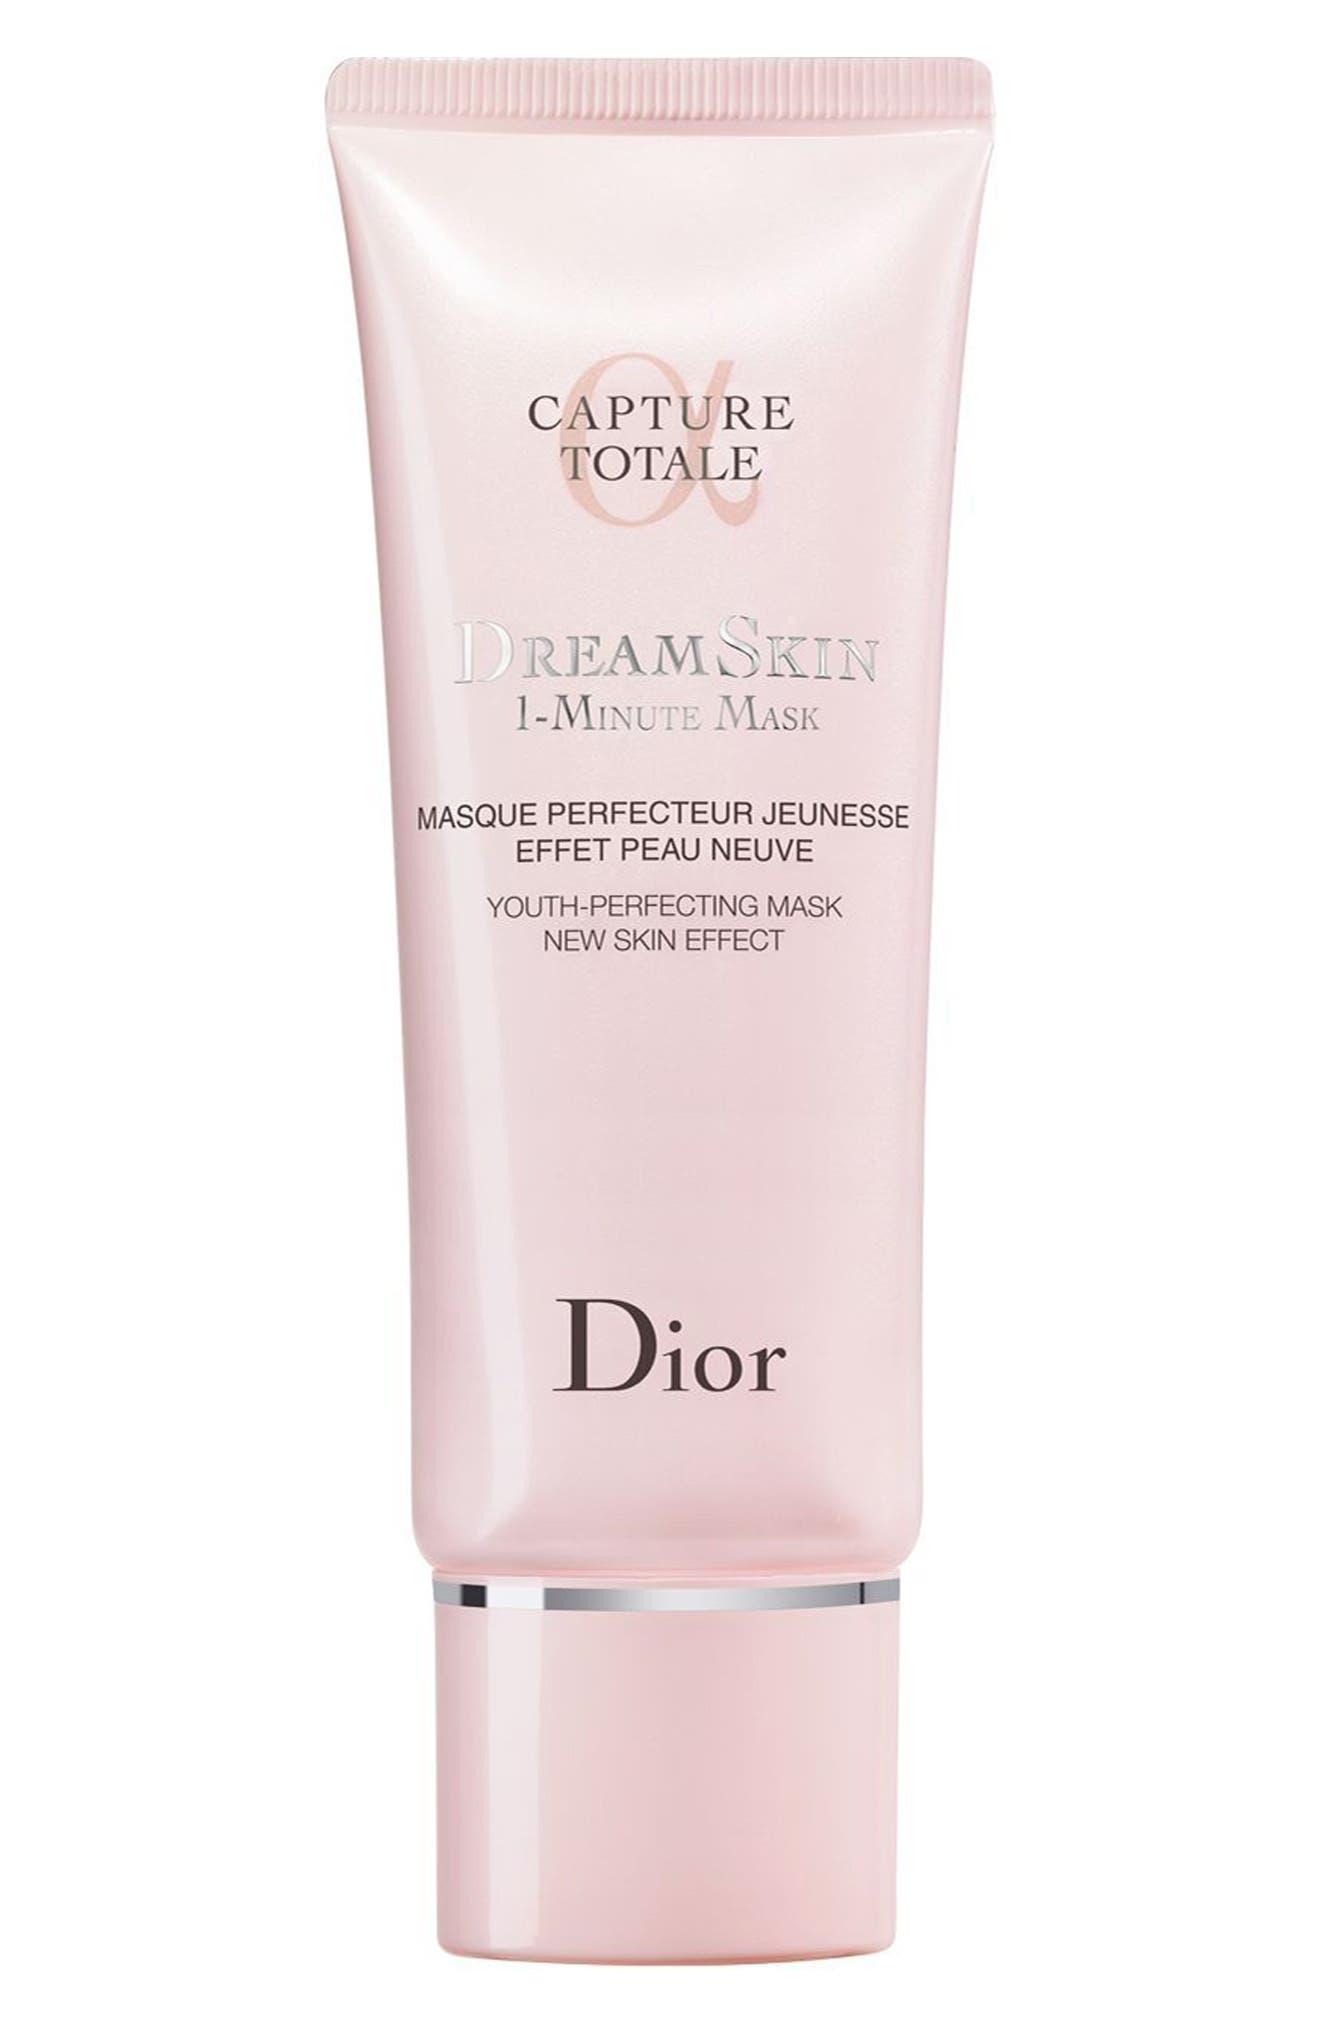 Alternate Image 1 Selected - Dior Capture Totale DreamSkin 1-Minute Mask